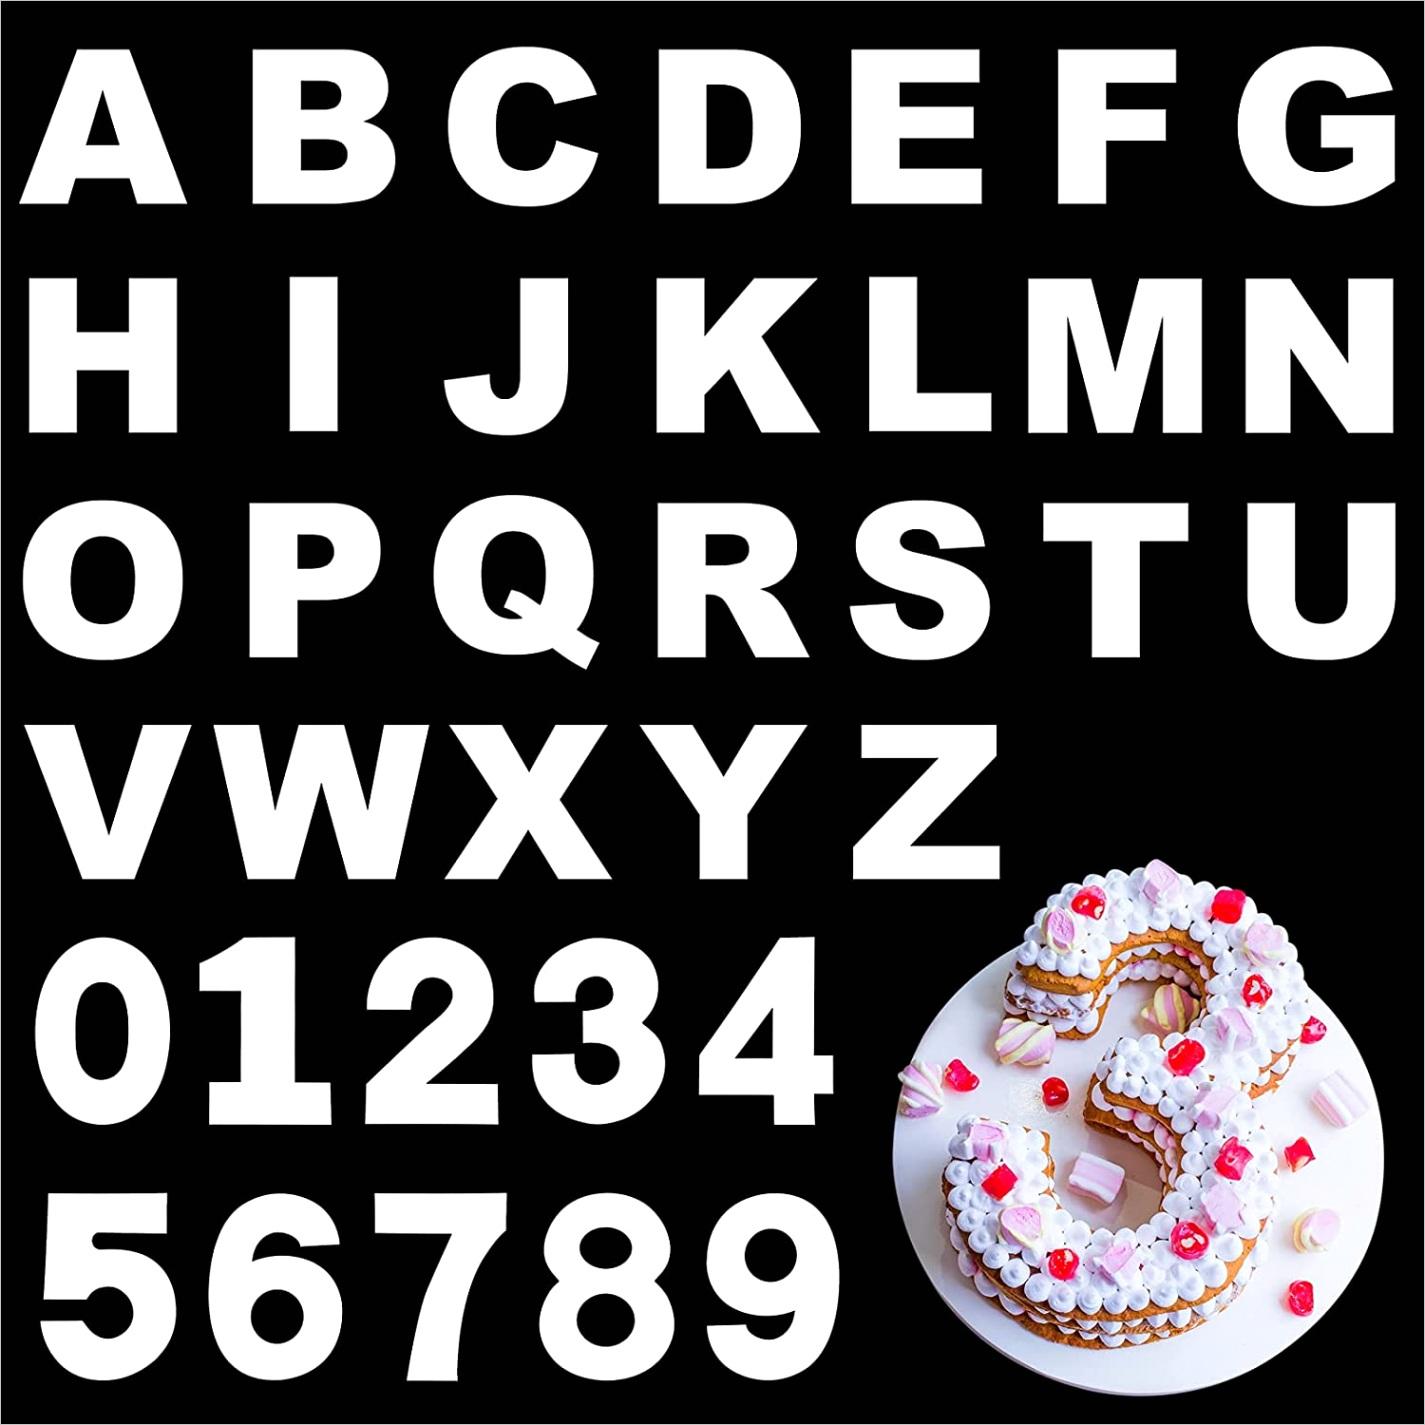 ZOILRI48 durony 8 inch cake alphabet decoration stencil a z 26 alphabet cake stencils 0 9 number cake templat